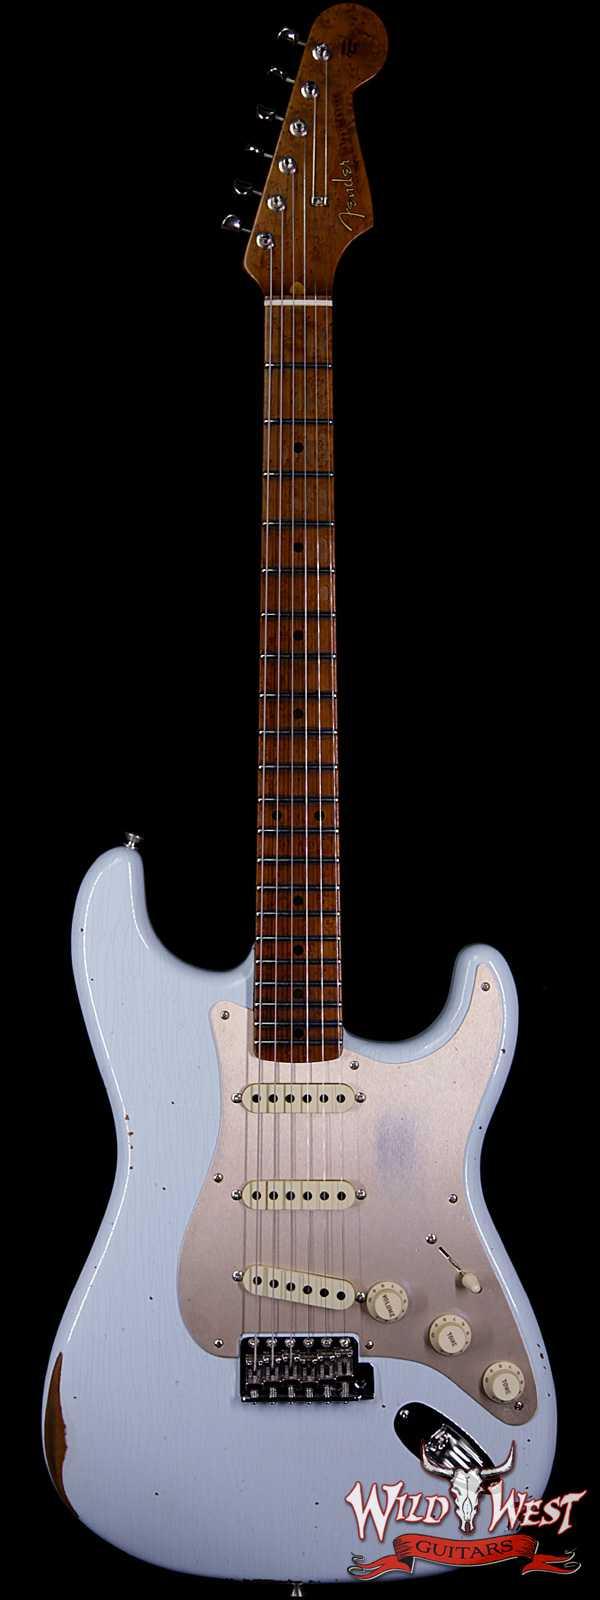 Fender Custom Shop 1956 Roasted Stratocaster Relic Birdseye Maple Neck Aged Sonic Blue